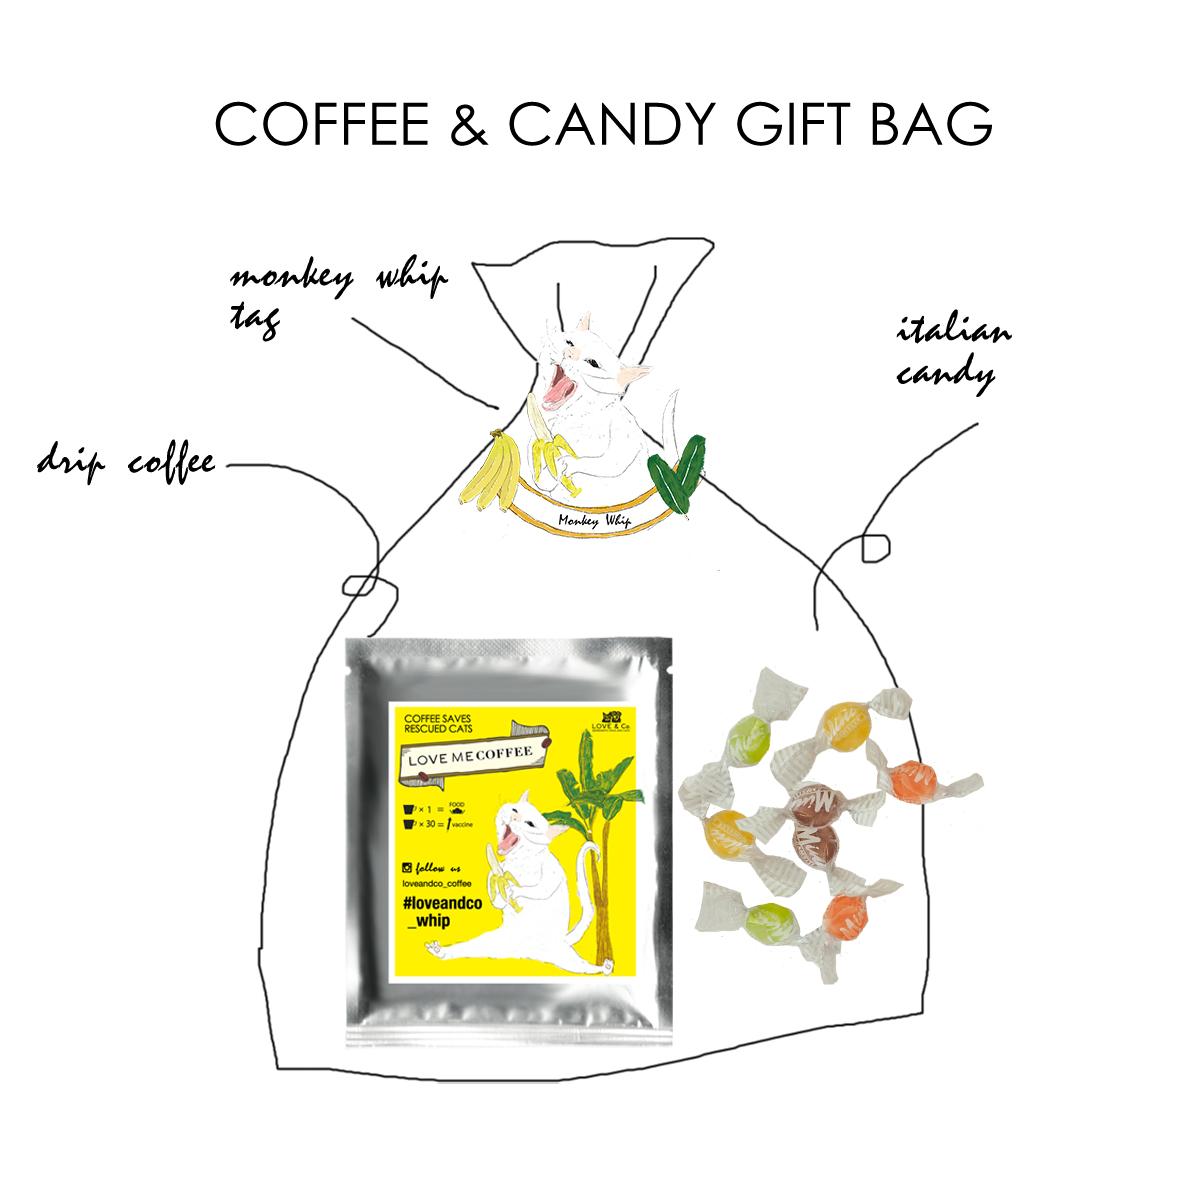 WHITEDAY GIFT A (コーヒー&キャンディー)画像